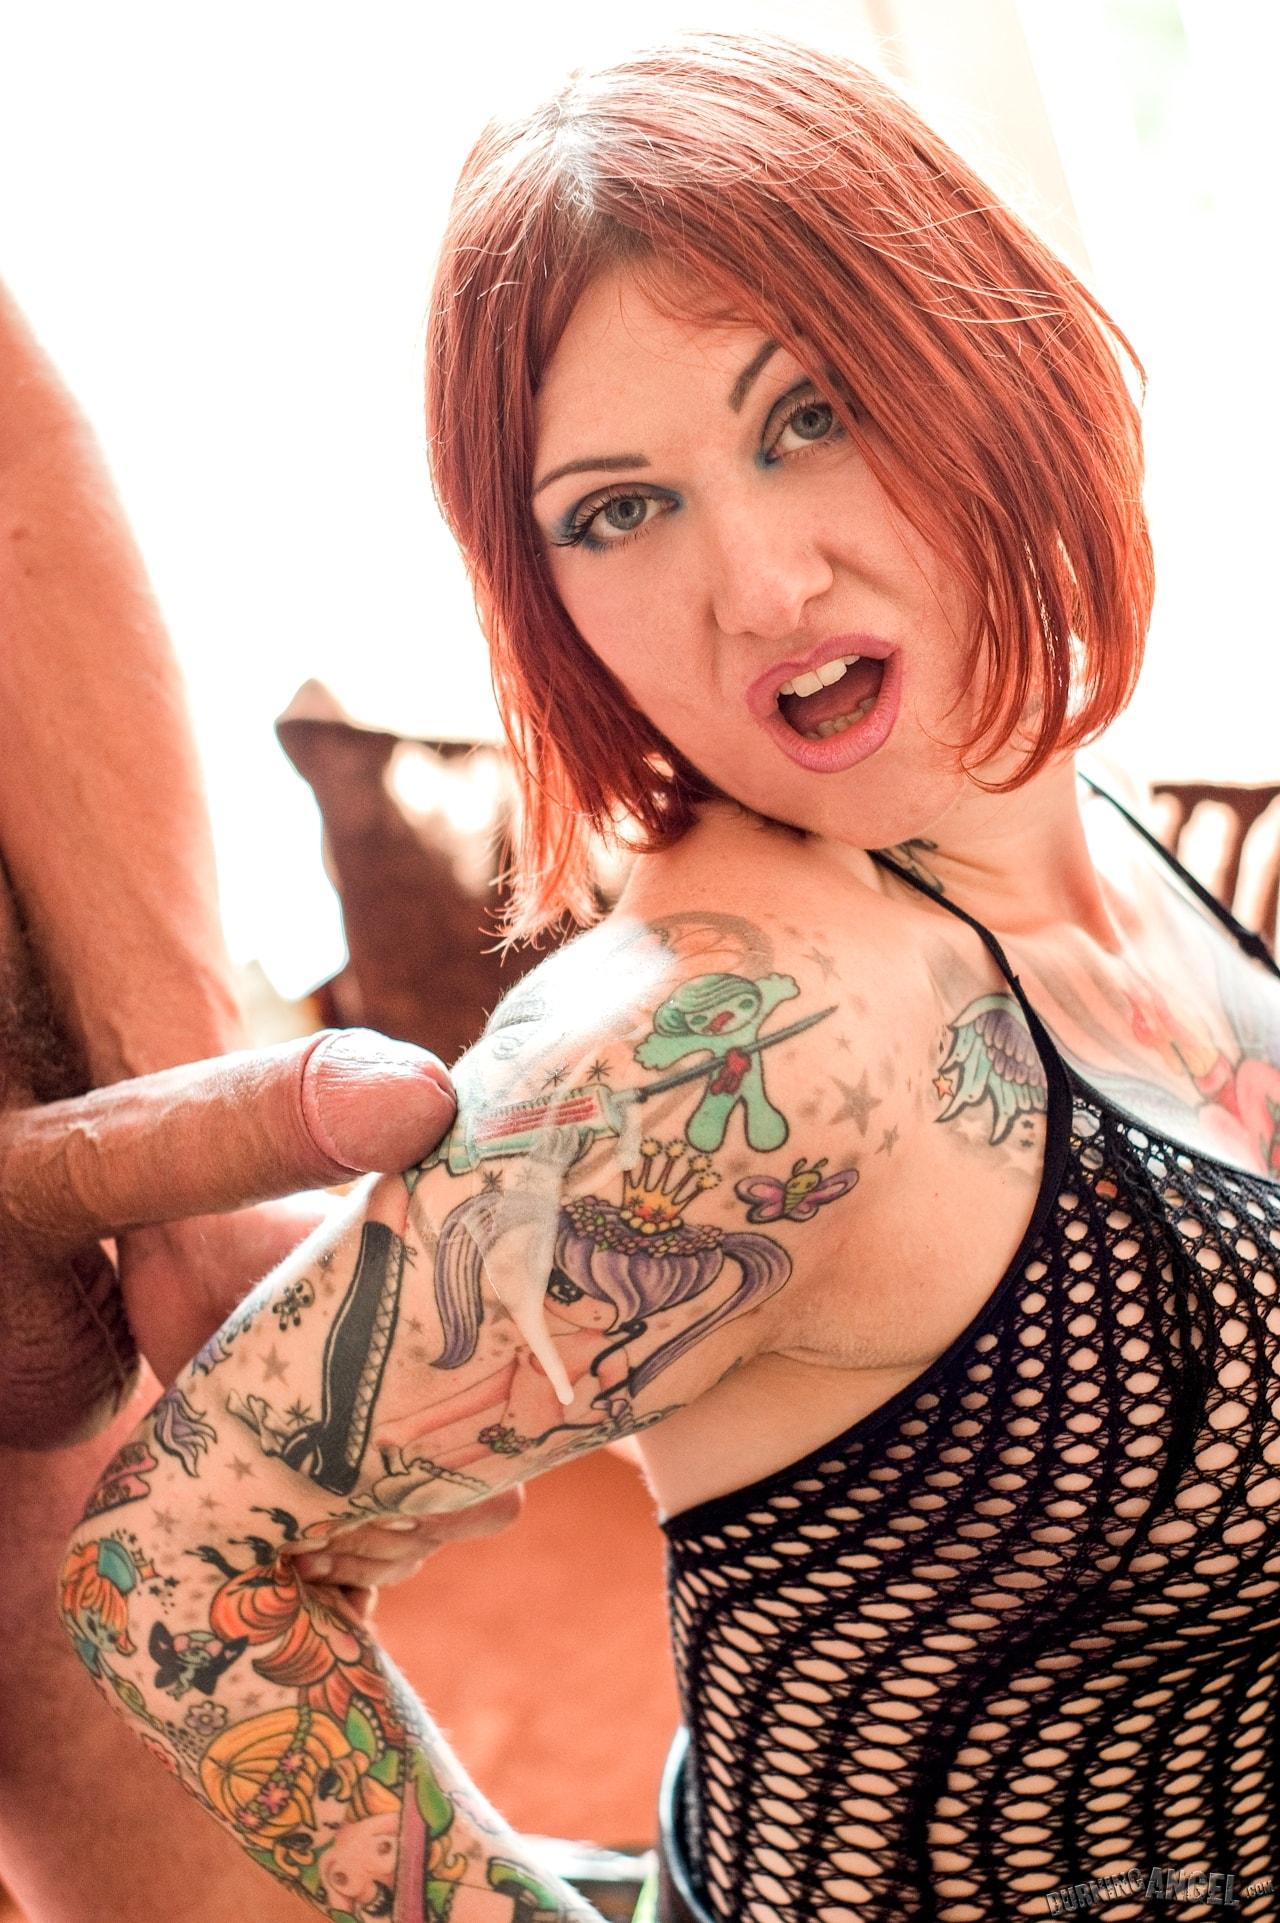 Burning Angel 'Spunk On My Tattoo' starring Tallulah (Photo 15)